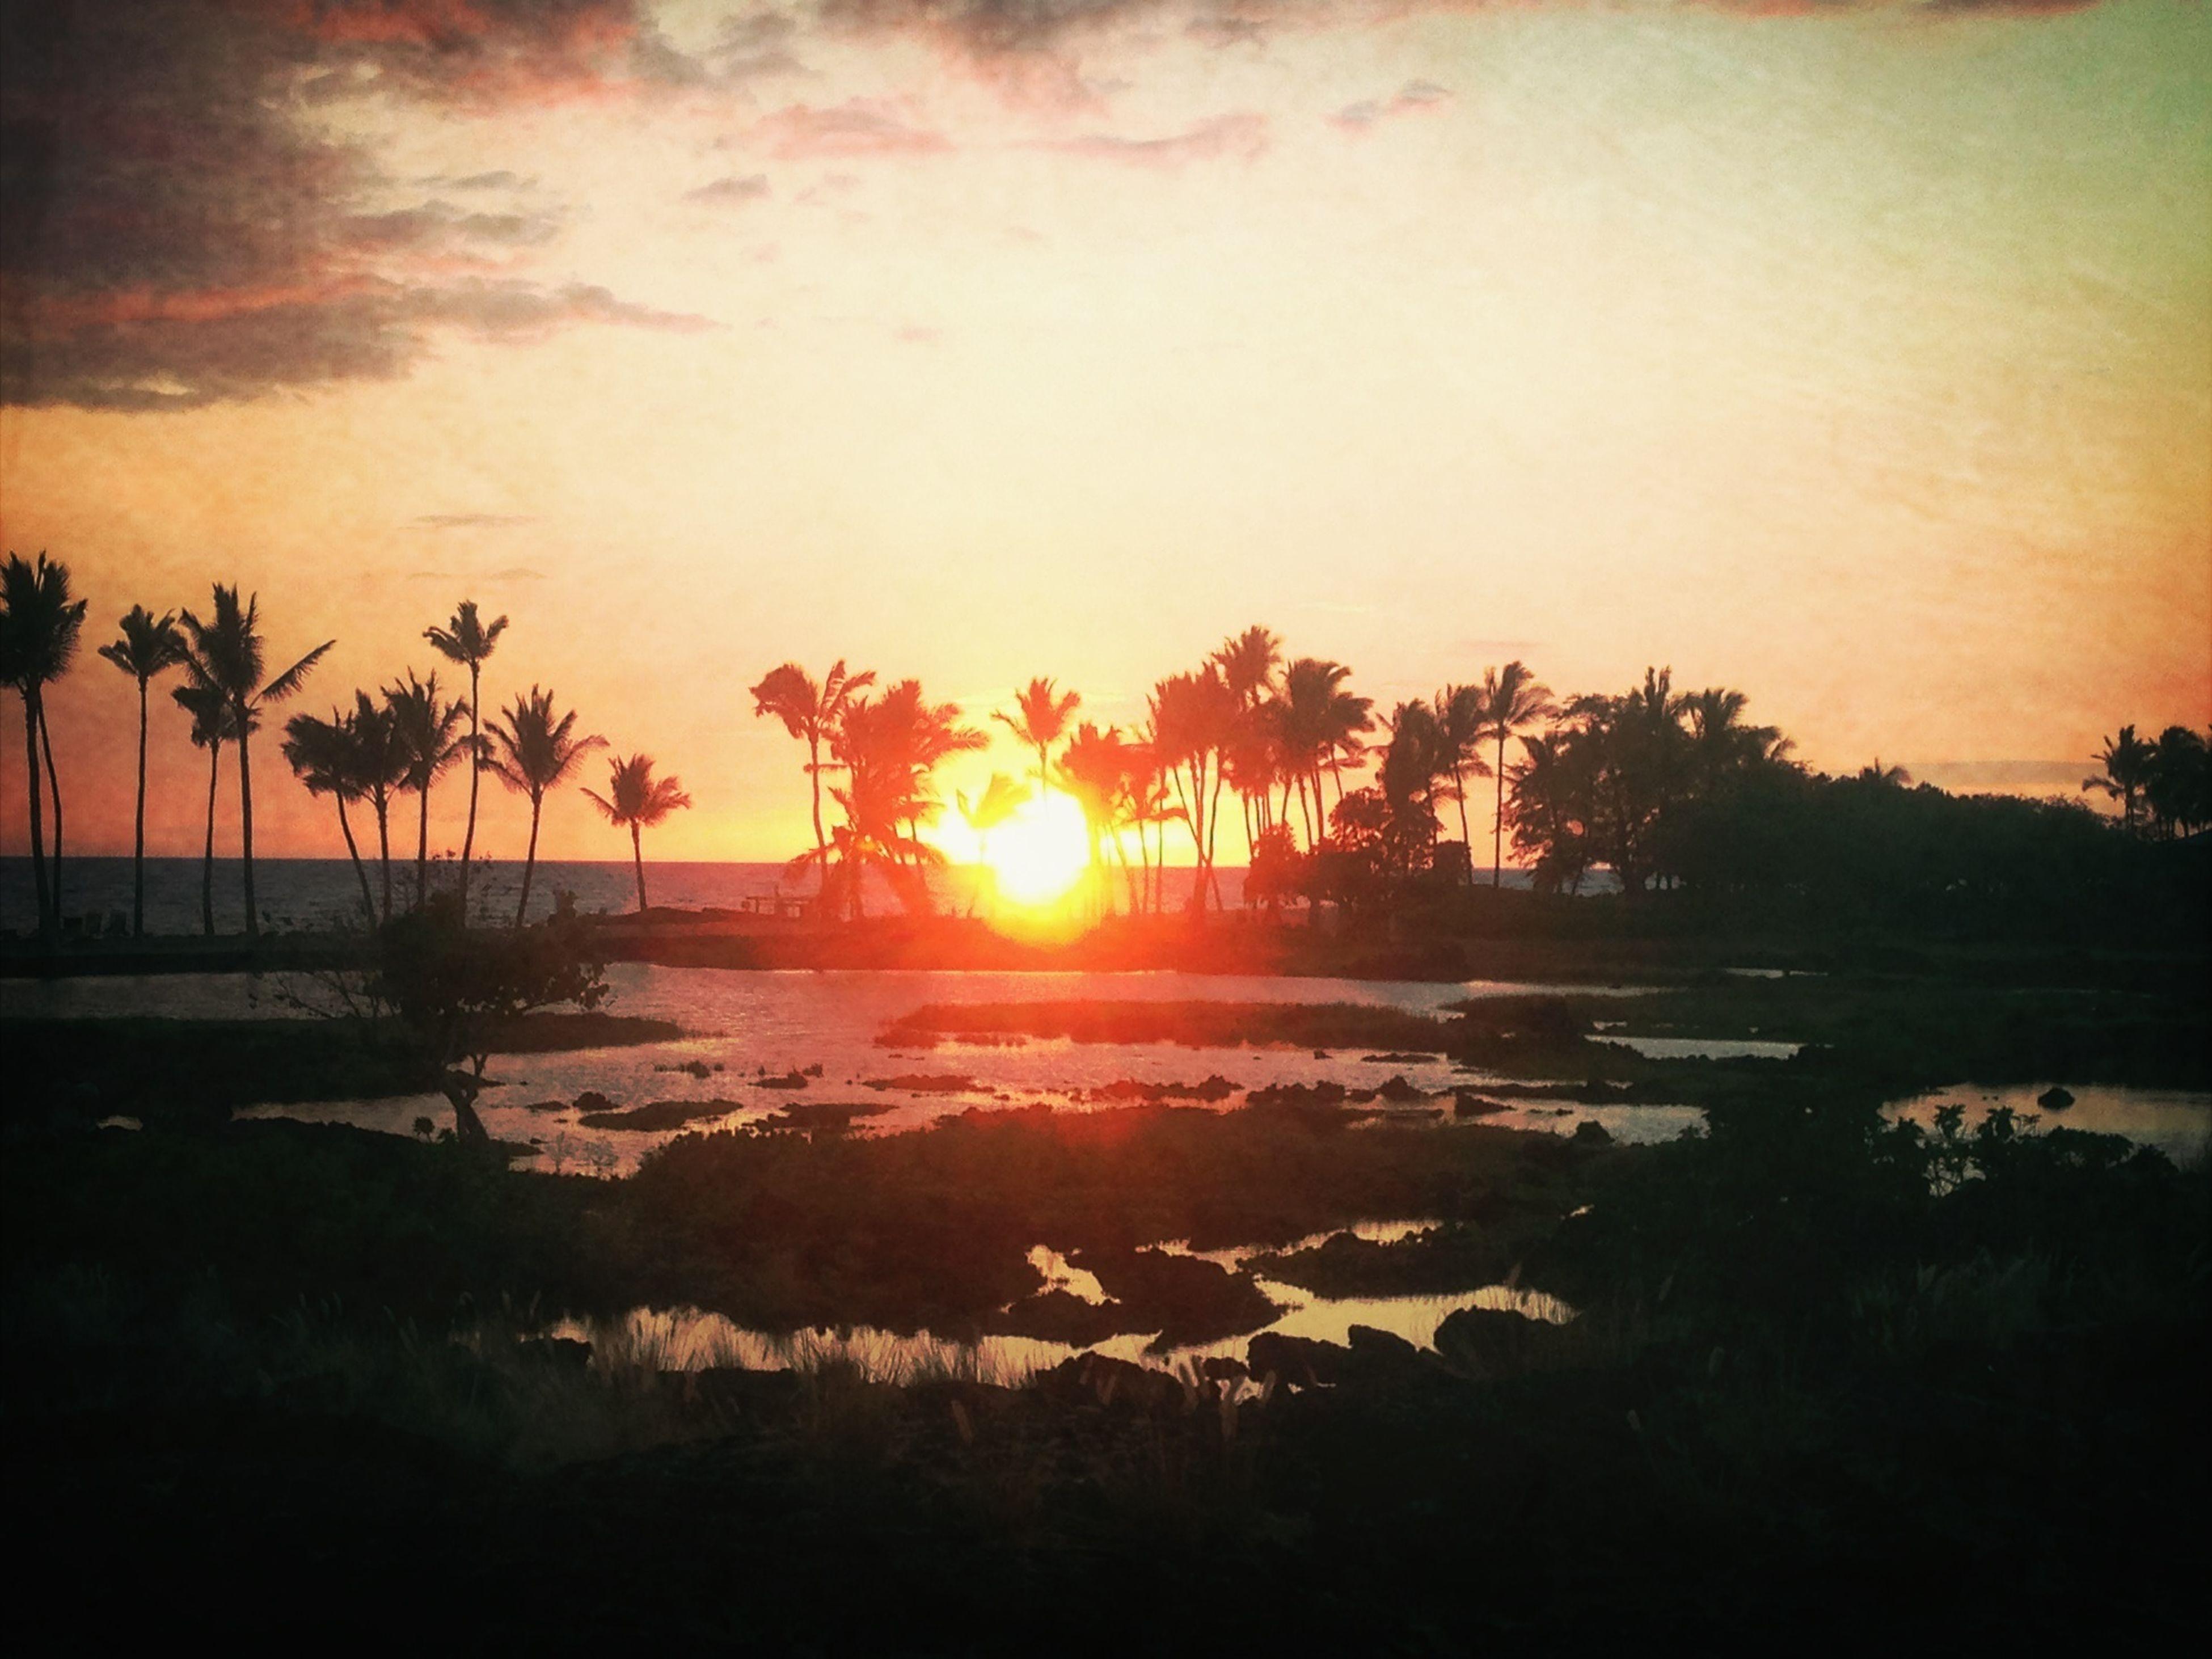 sunset, sun, water, tranquil scene, scenics, tranquility, beauty in nature, sea, orange color, beach, tree, sky, nature, idyllic, reflection, silhouette, sunlight, shore, palm tree, sunbeam